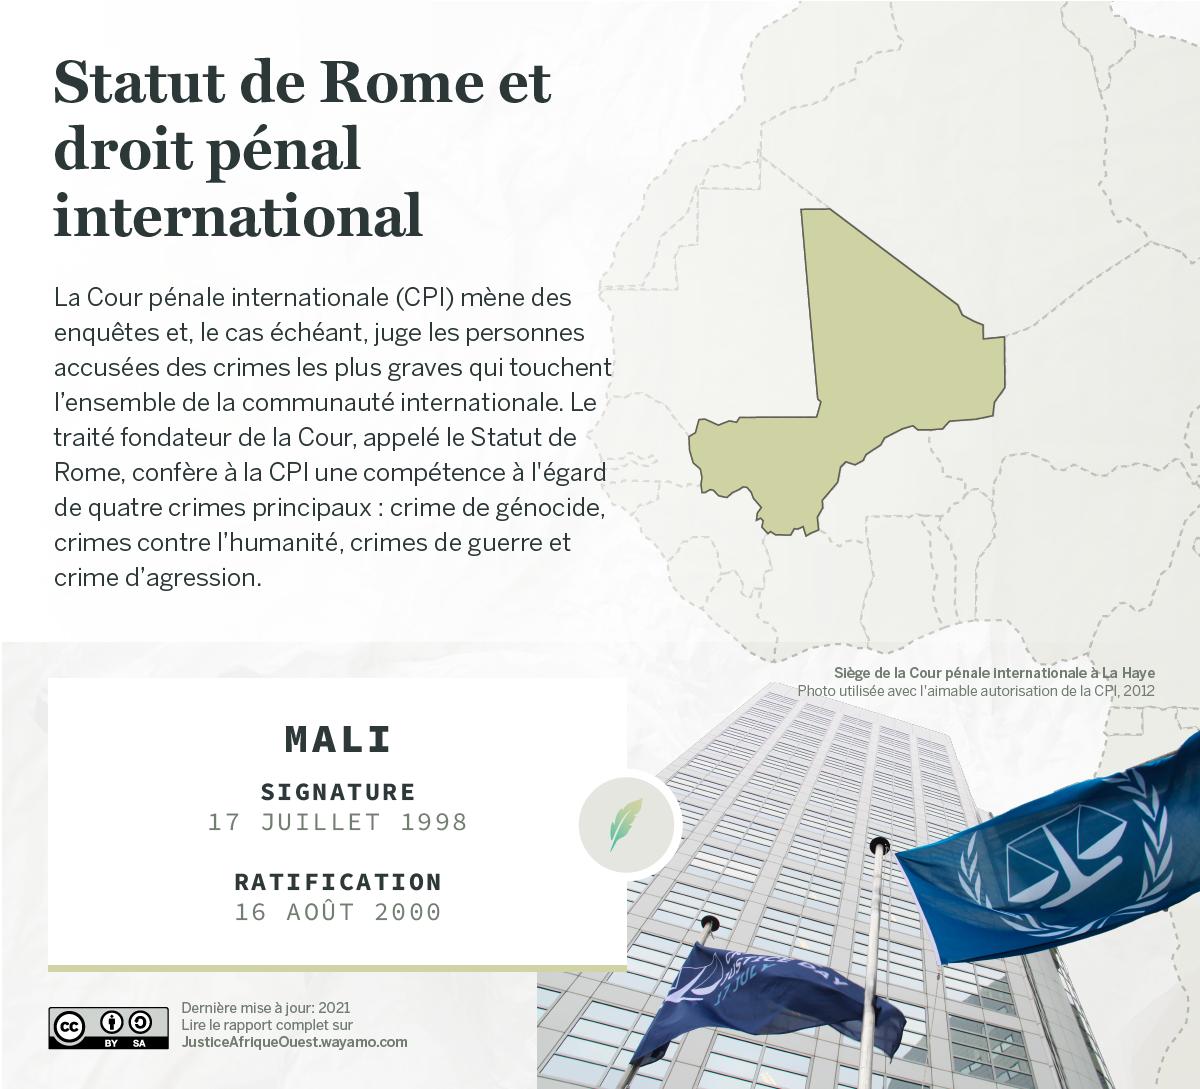 MALI_Statut de Rome - Wayamo Foundation (CC BY-SA 4.0)